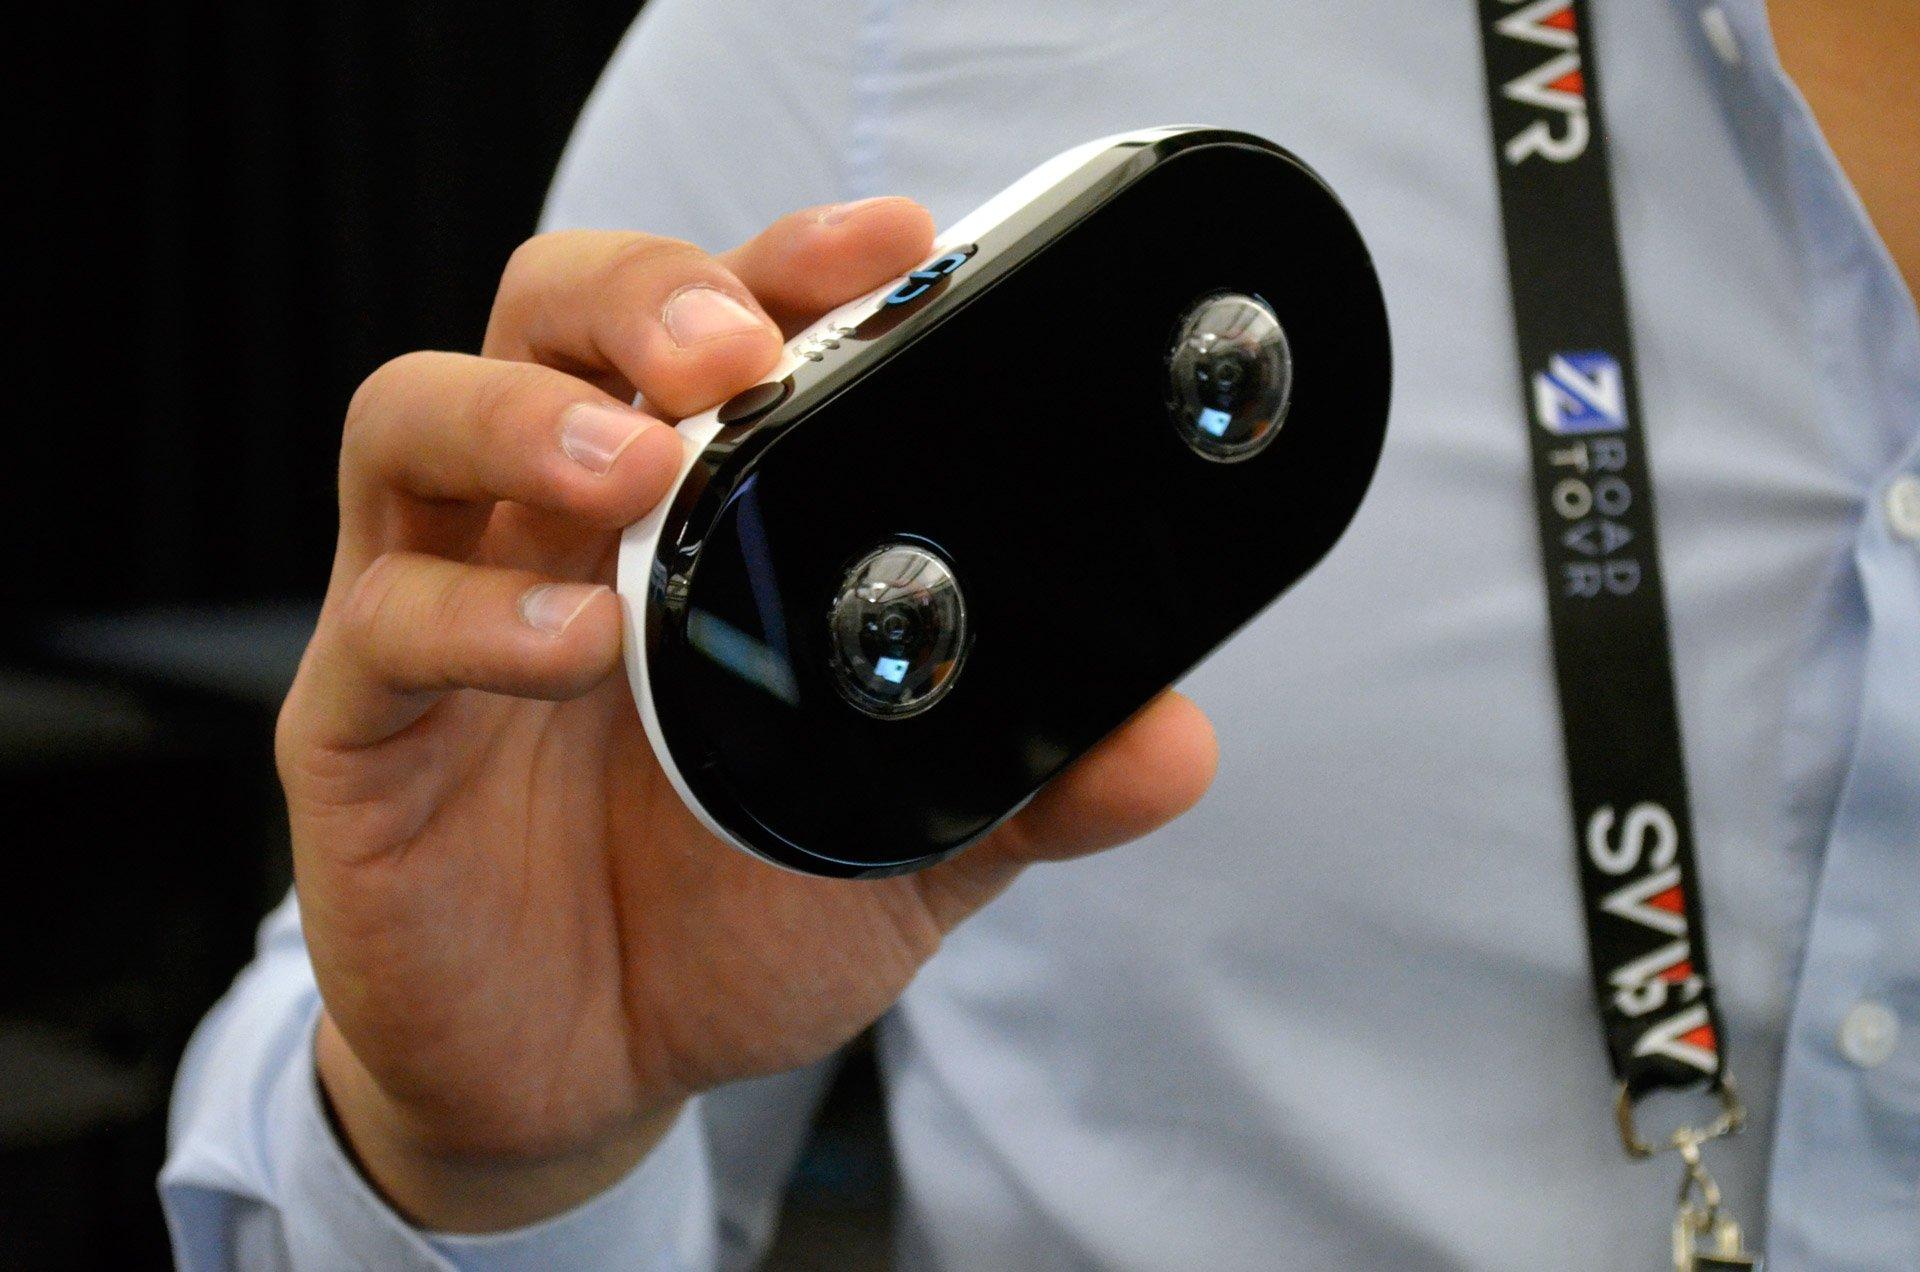 lucidcam-virtual-reality-camera-2